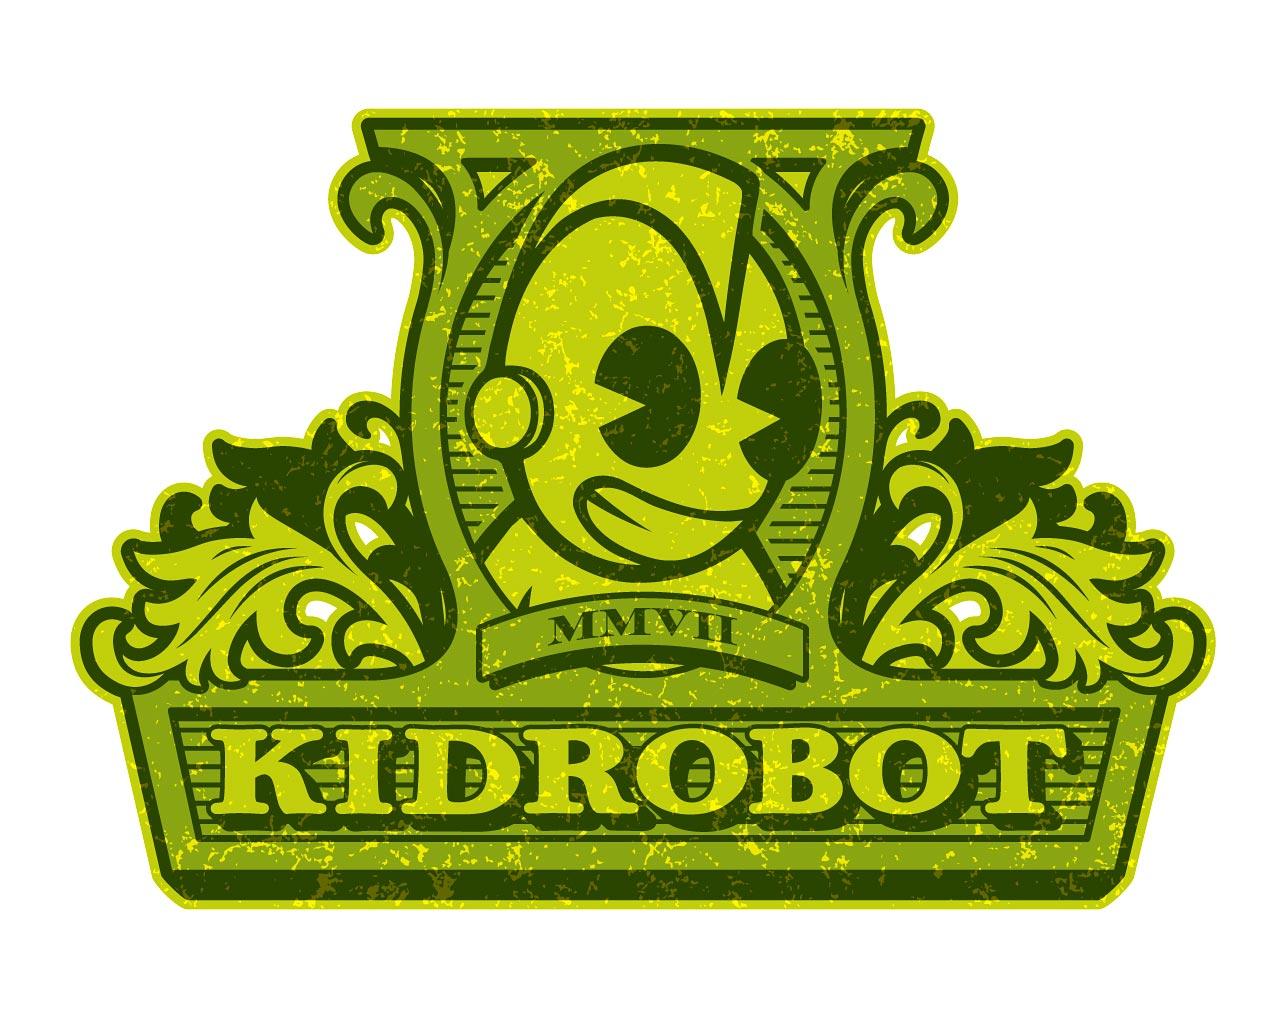 Kid Robot   Vinyl Toys Wallpaper 523642 1280x1024